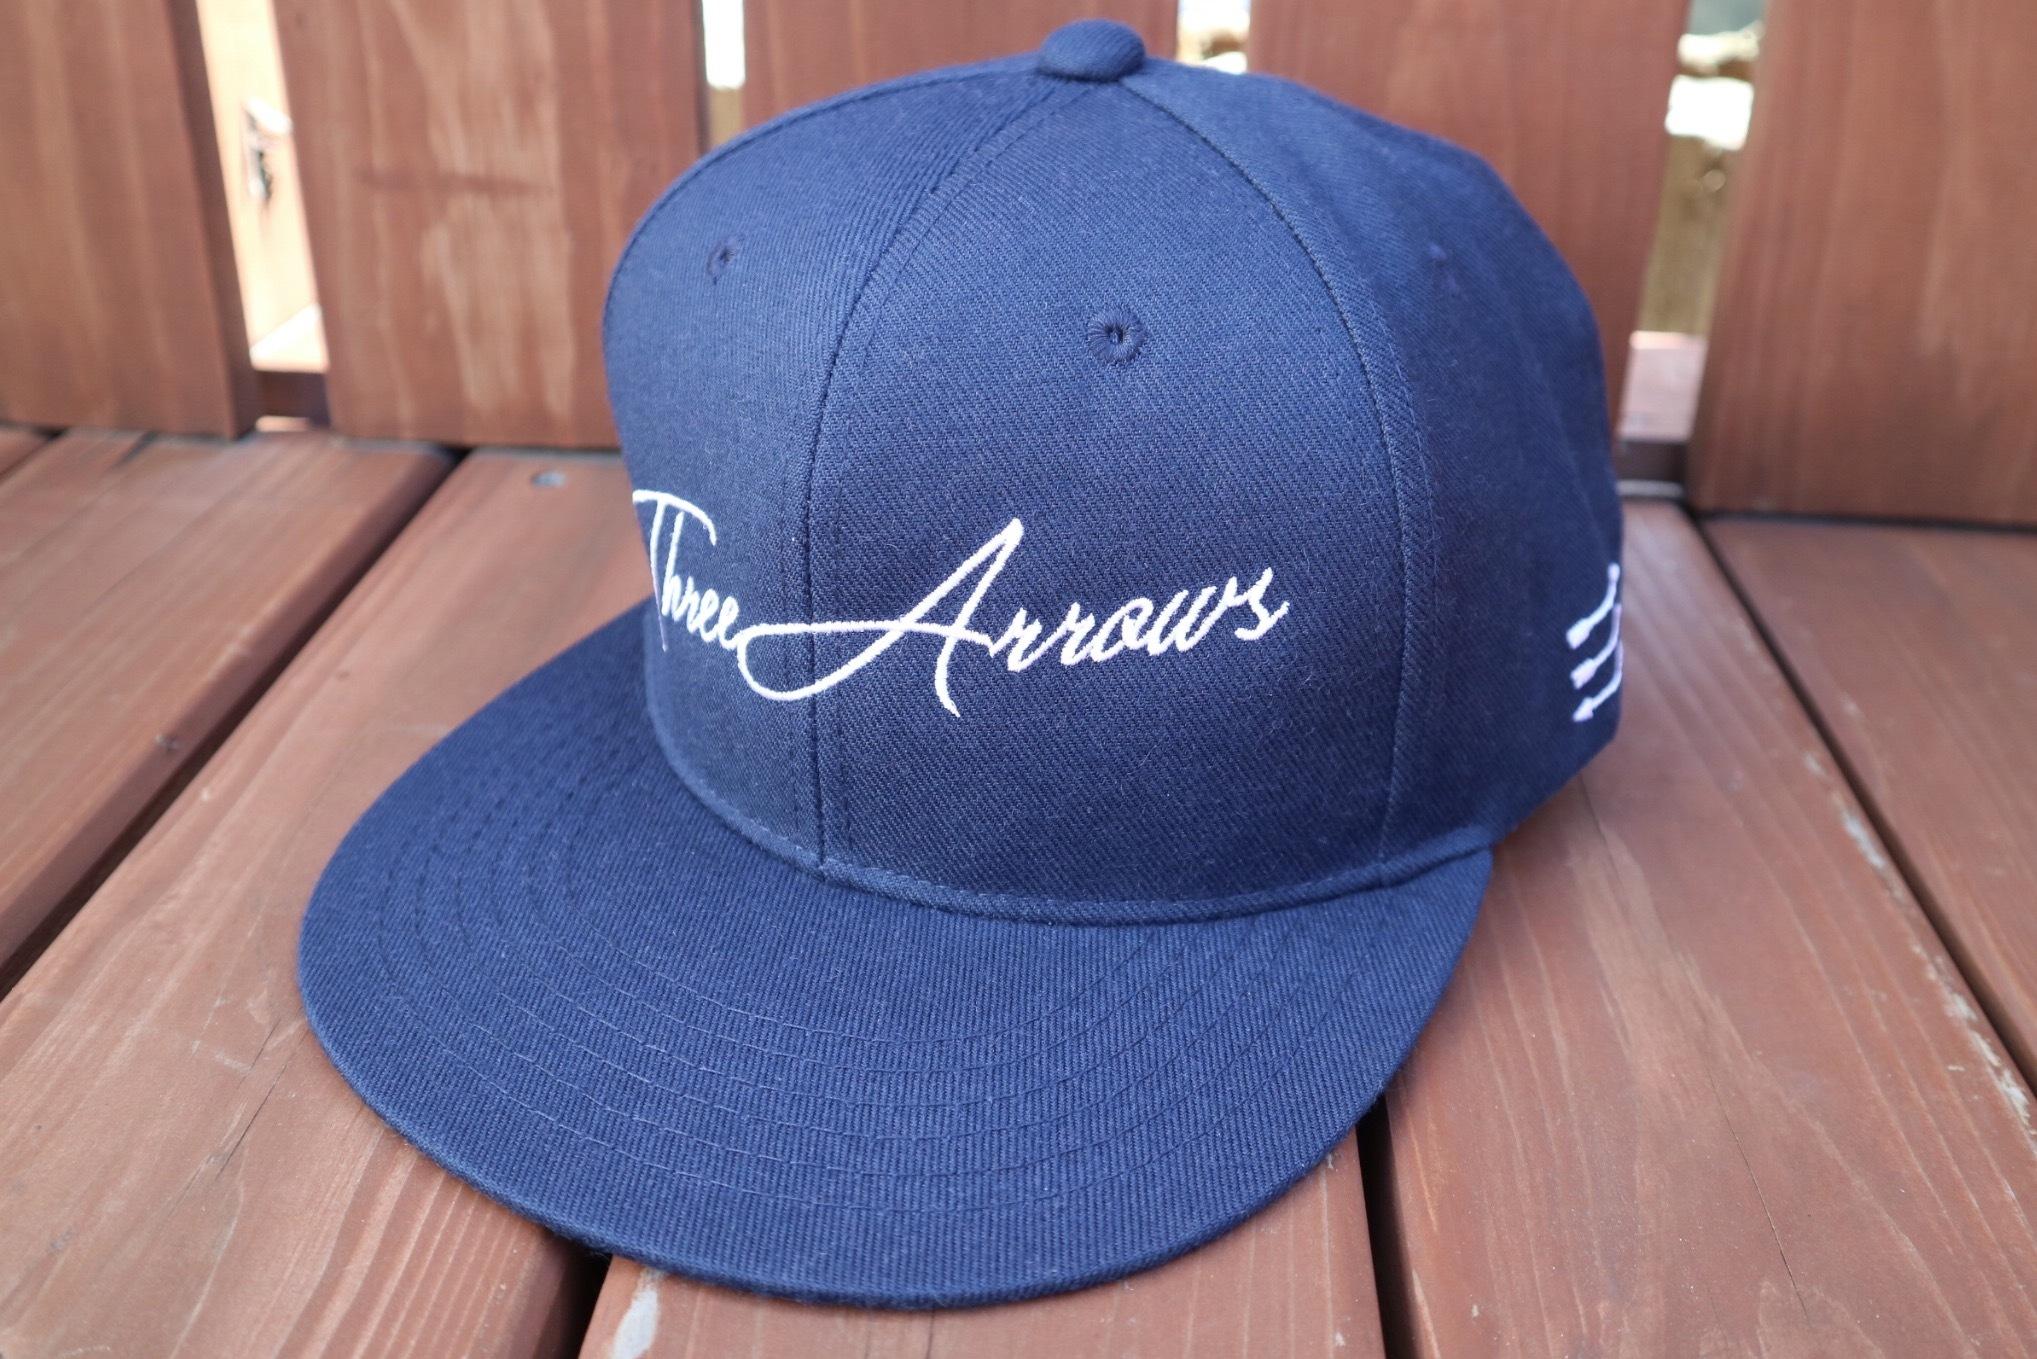 ThreeArrows スナップバックCAP(navy)